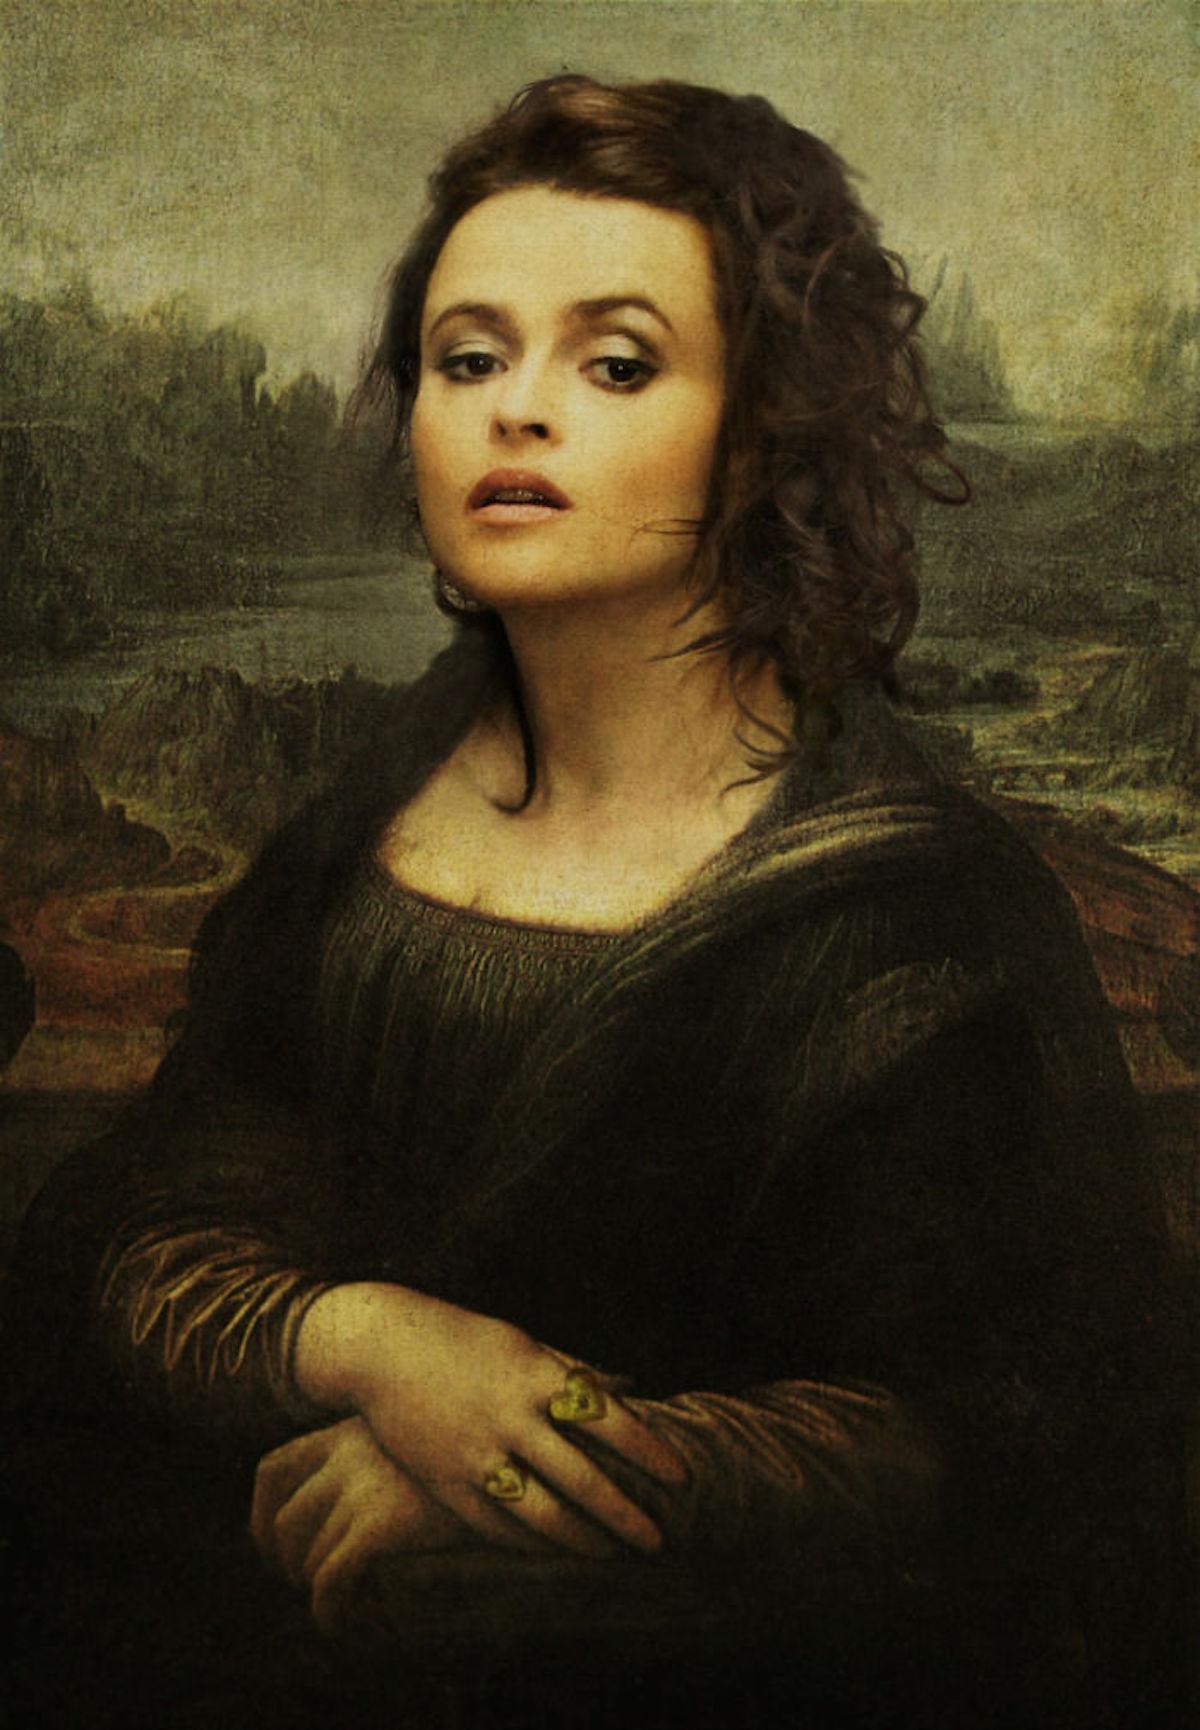 Helena Bonham Carter Art Digital Design Crowd